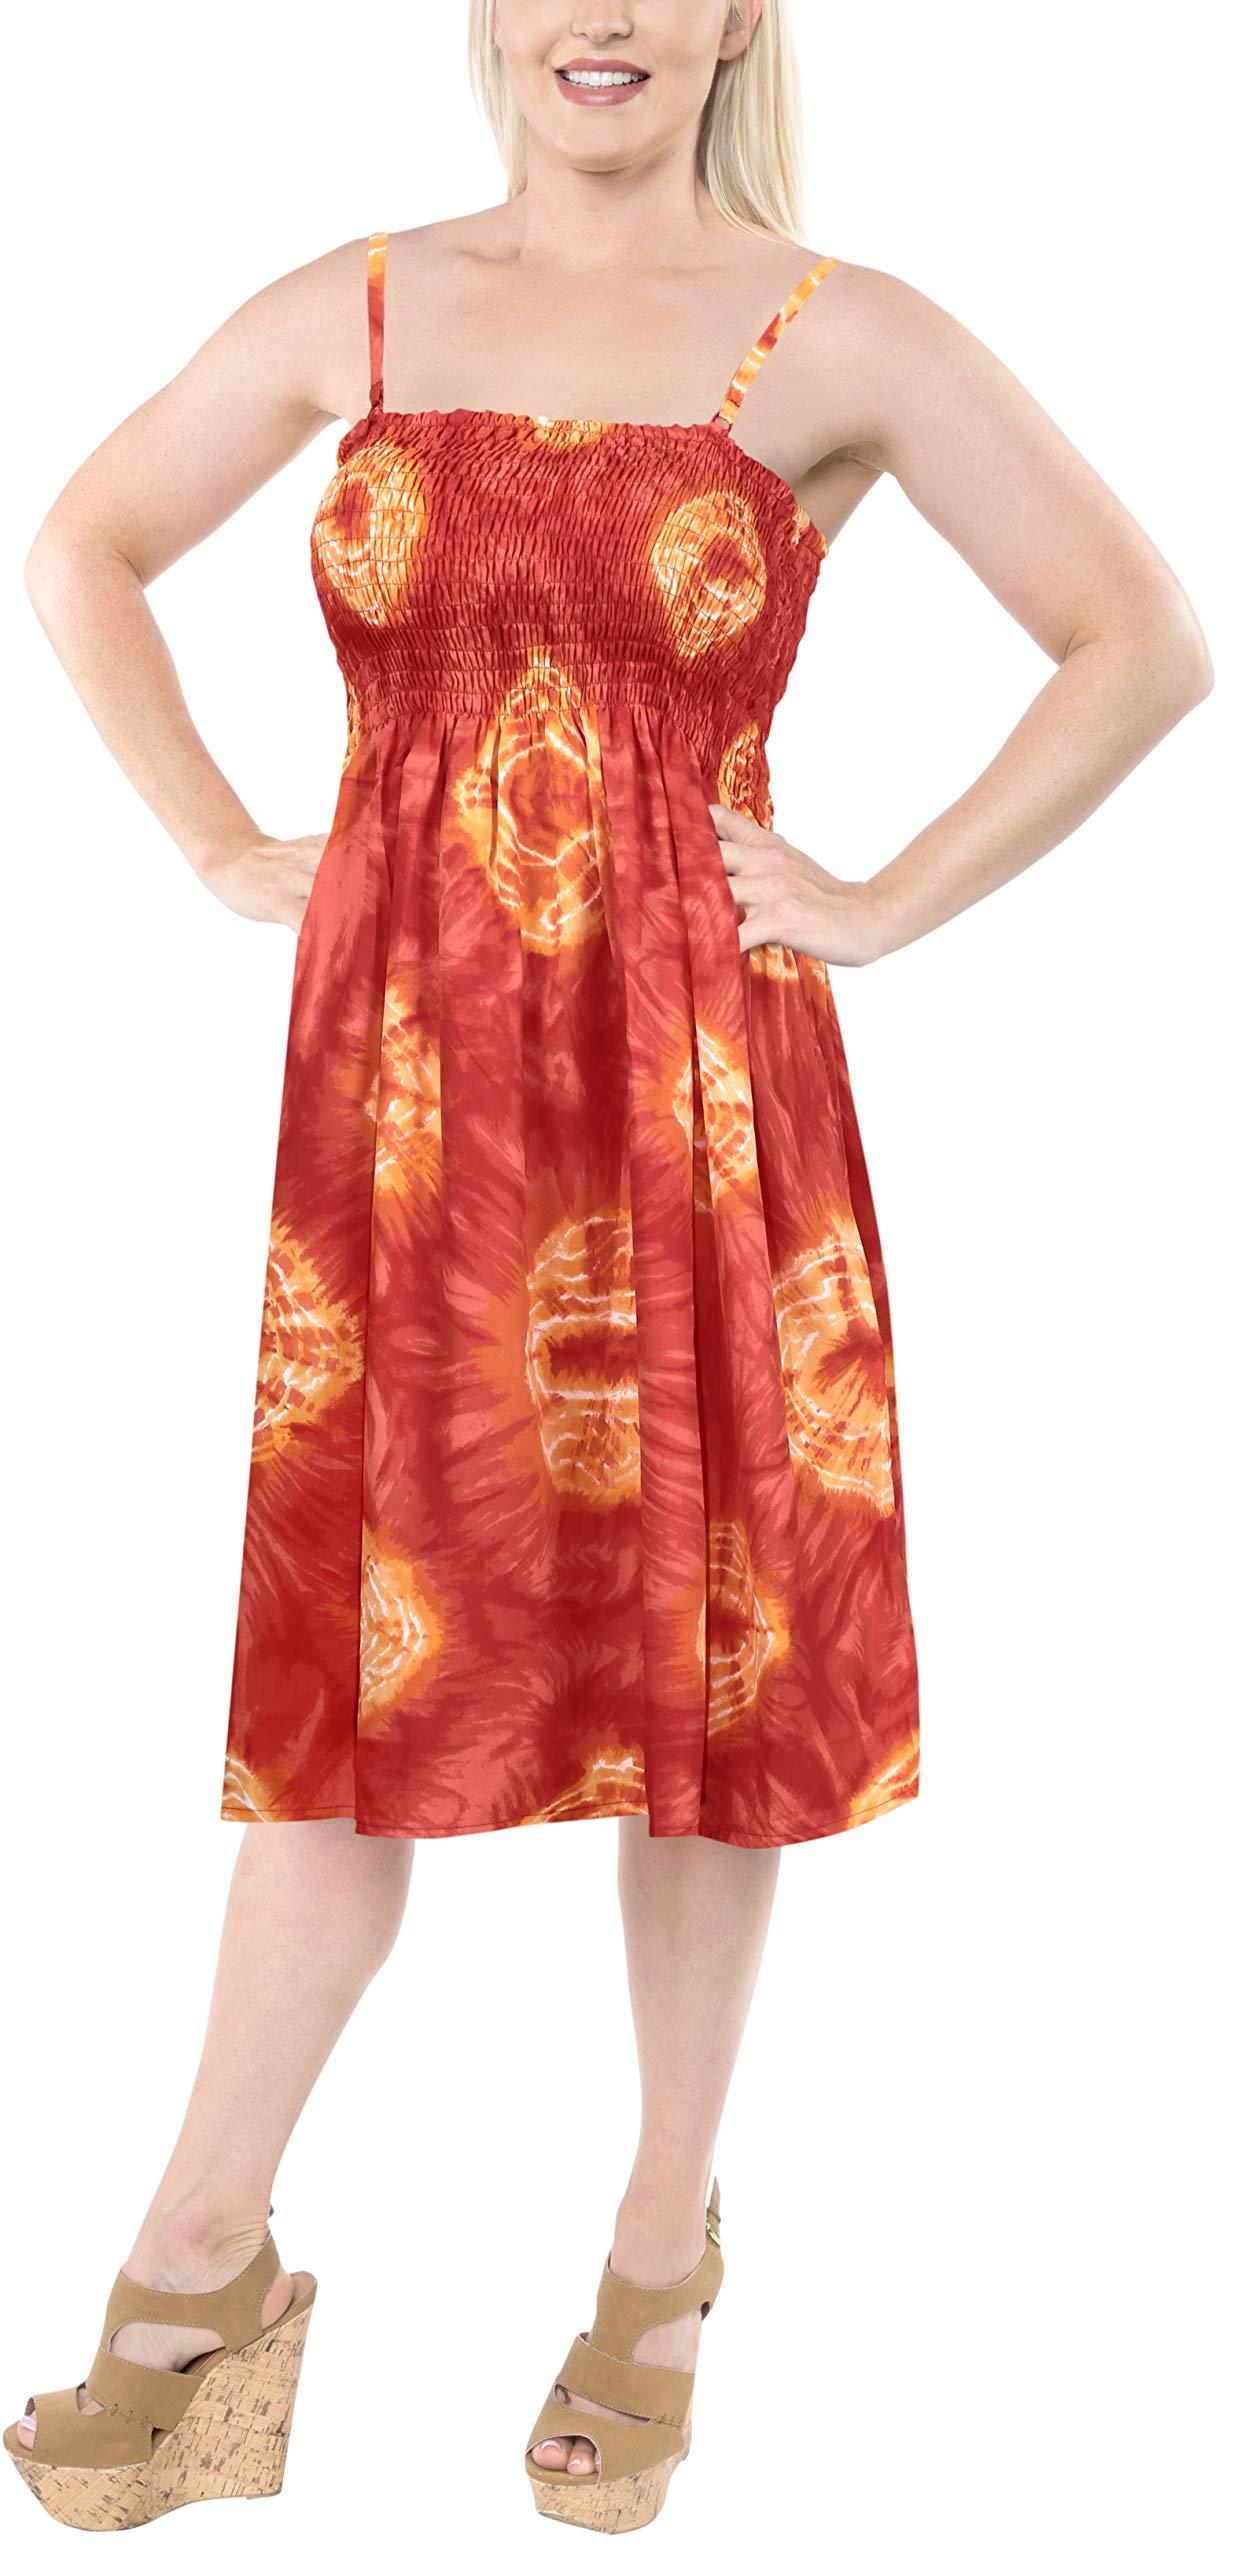 LA LEELA Soft  Printed Casual Swimwear Stretchy Tube Dress Orange 1098 One Size